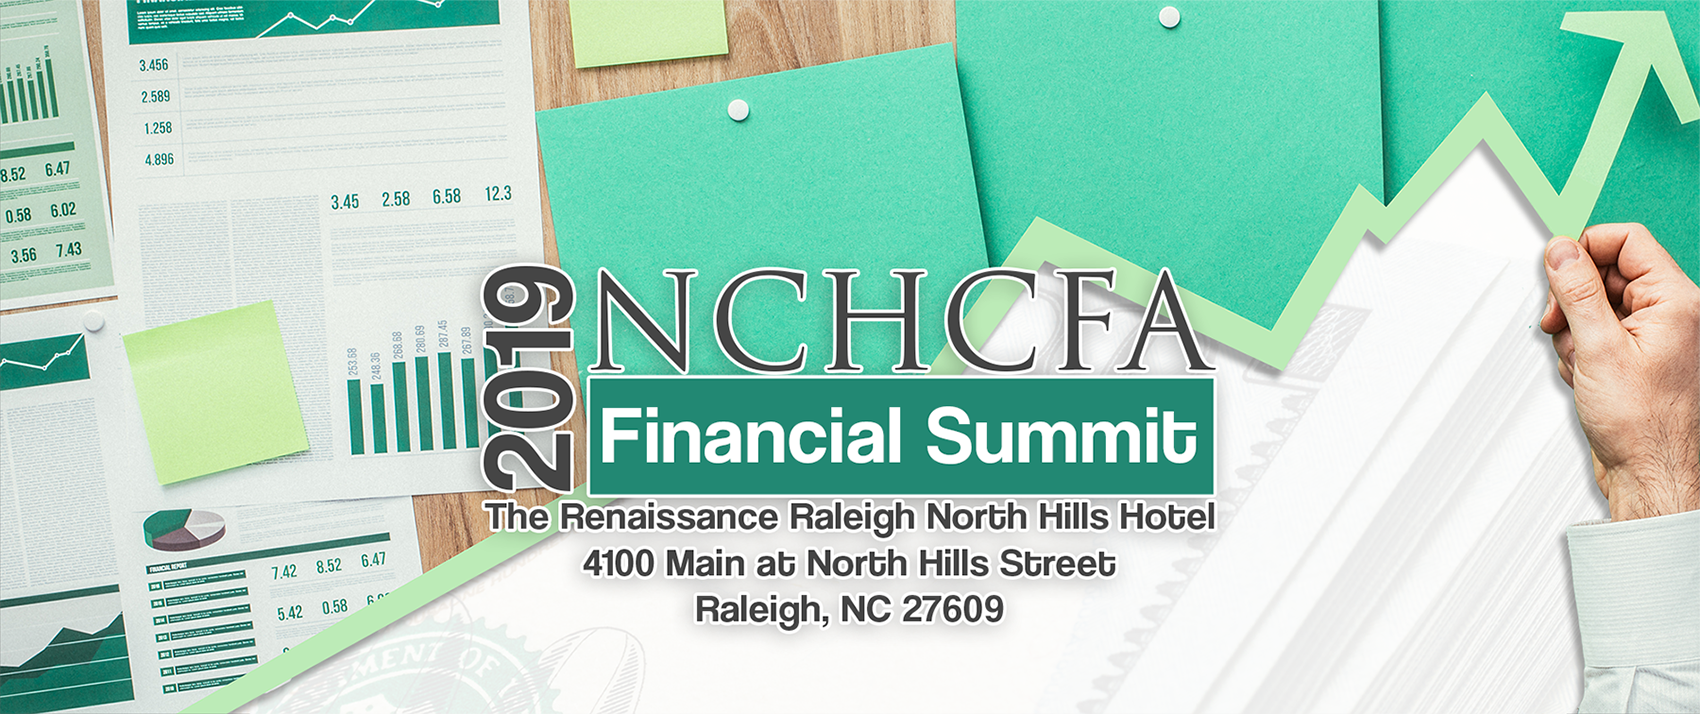 2019 NCHCFA Financial Summit